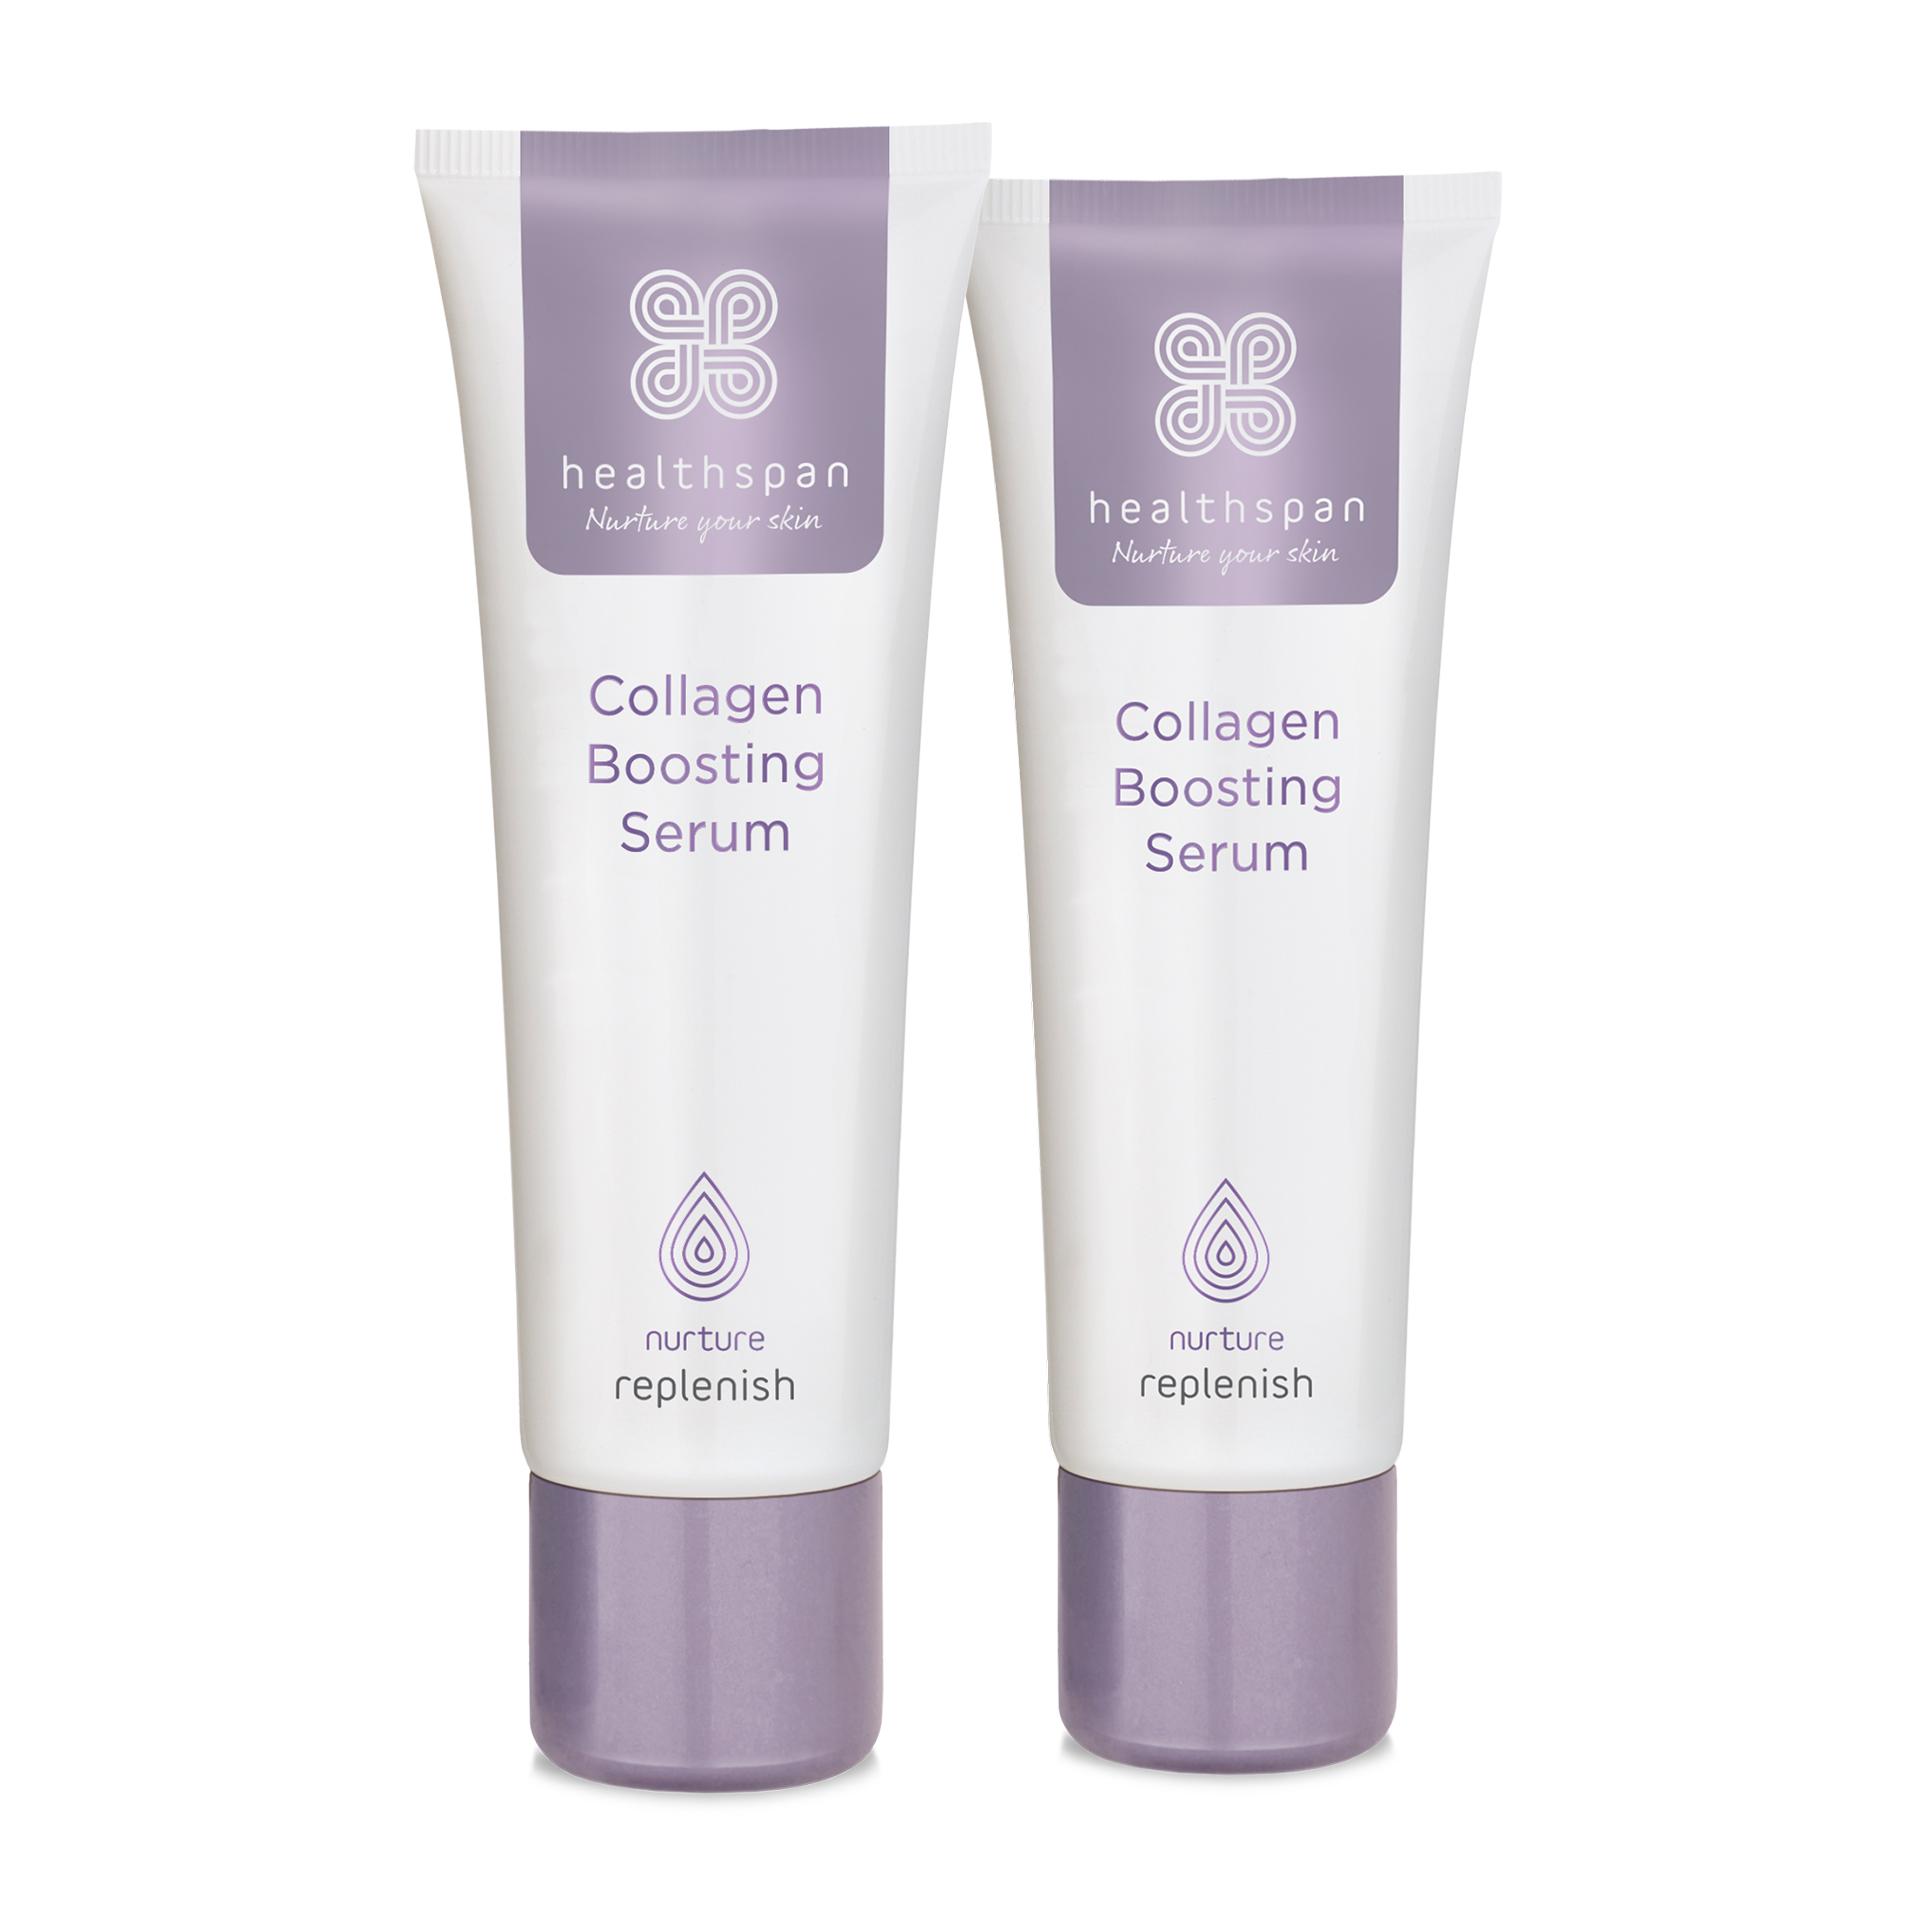 Healthspan Replenish Collagen Boosting Serum Duo Pack - 2 x 30ml Tube